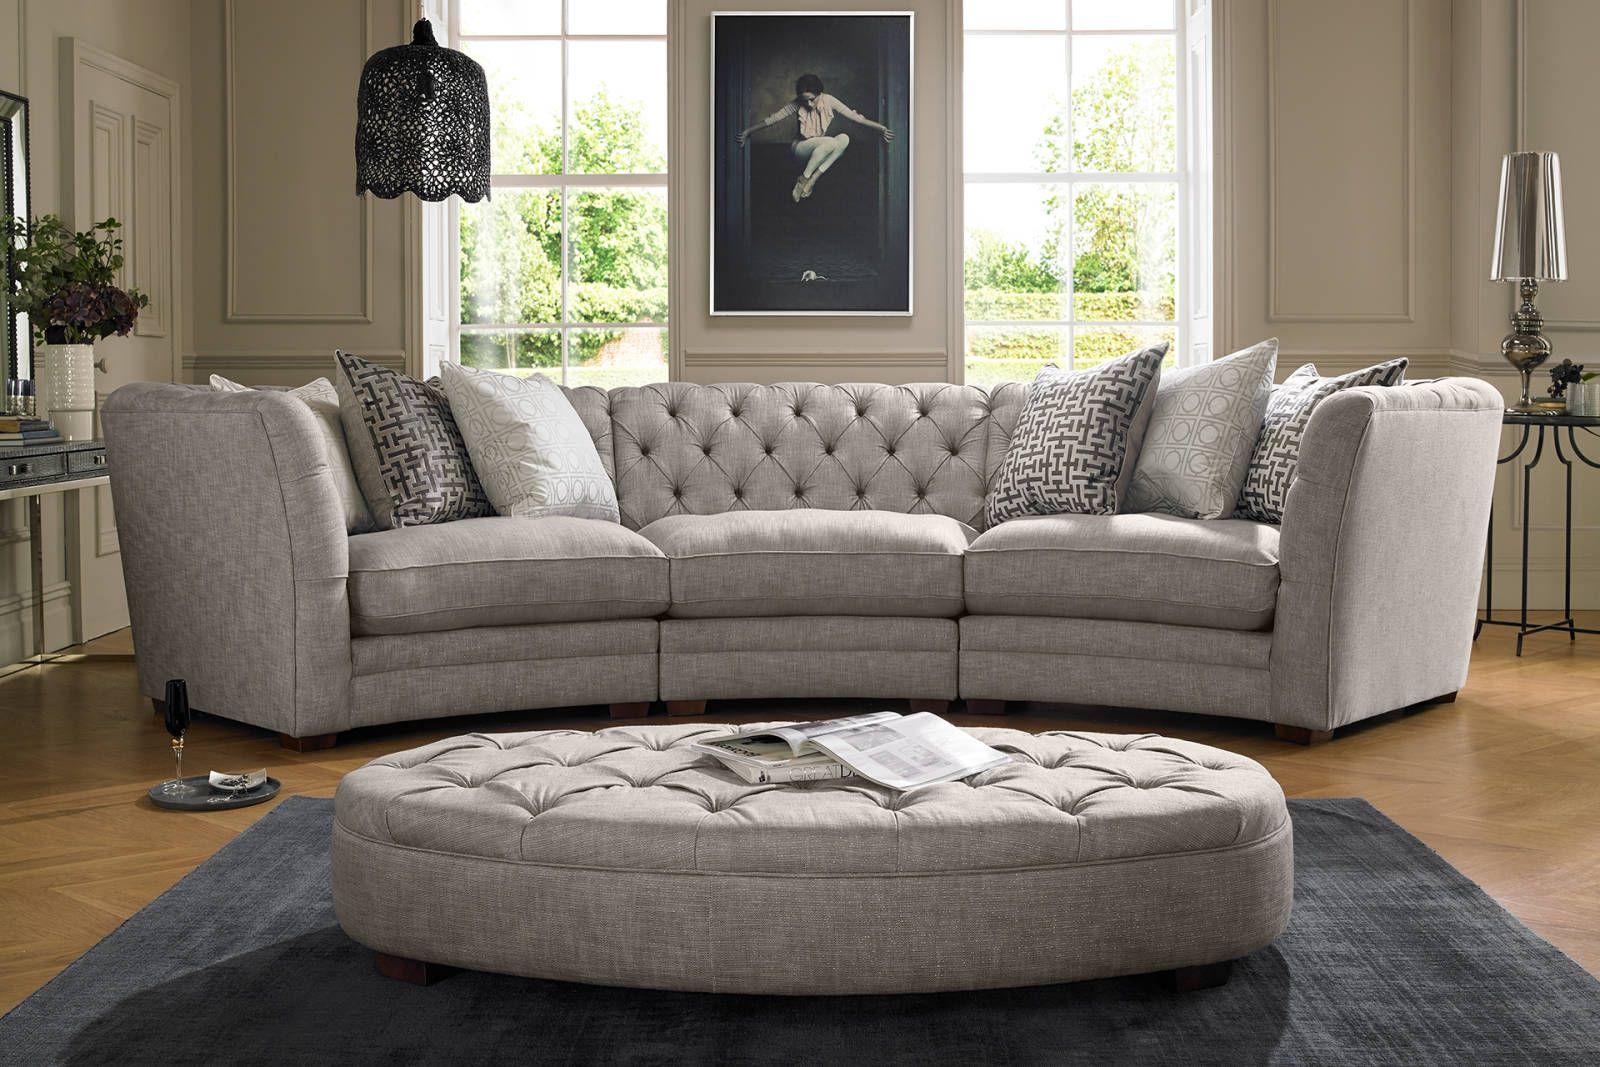 Cristiana Sofology Family Room Sofa Curved Sofa Comfy Living Room